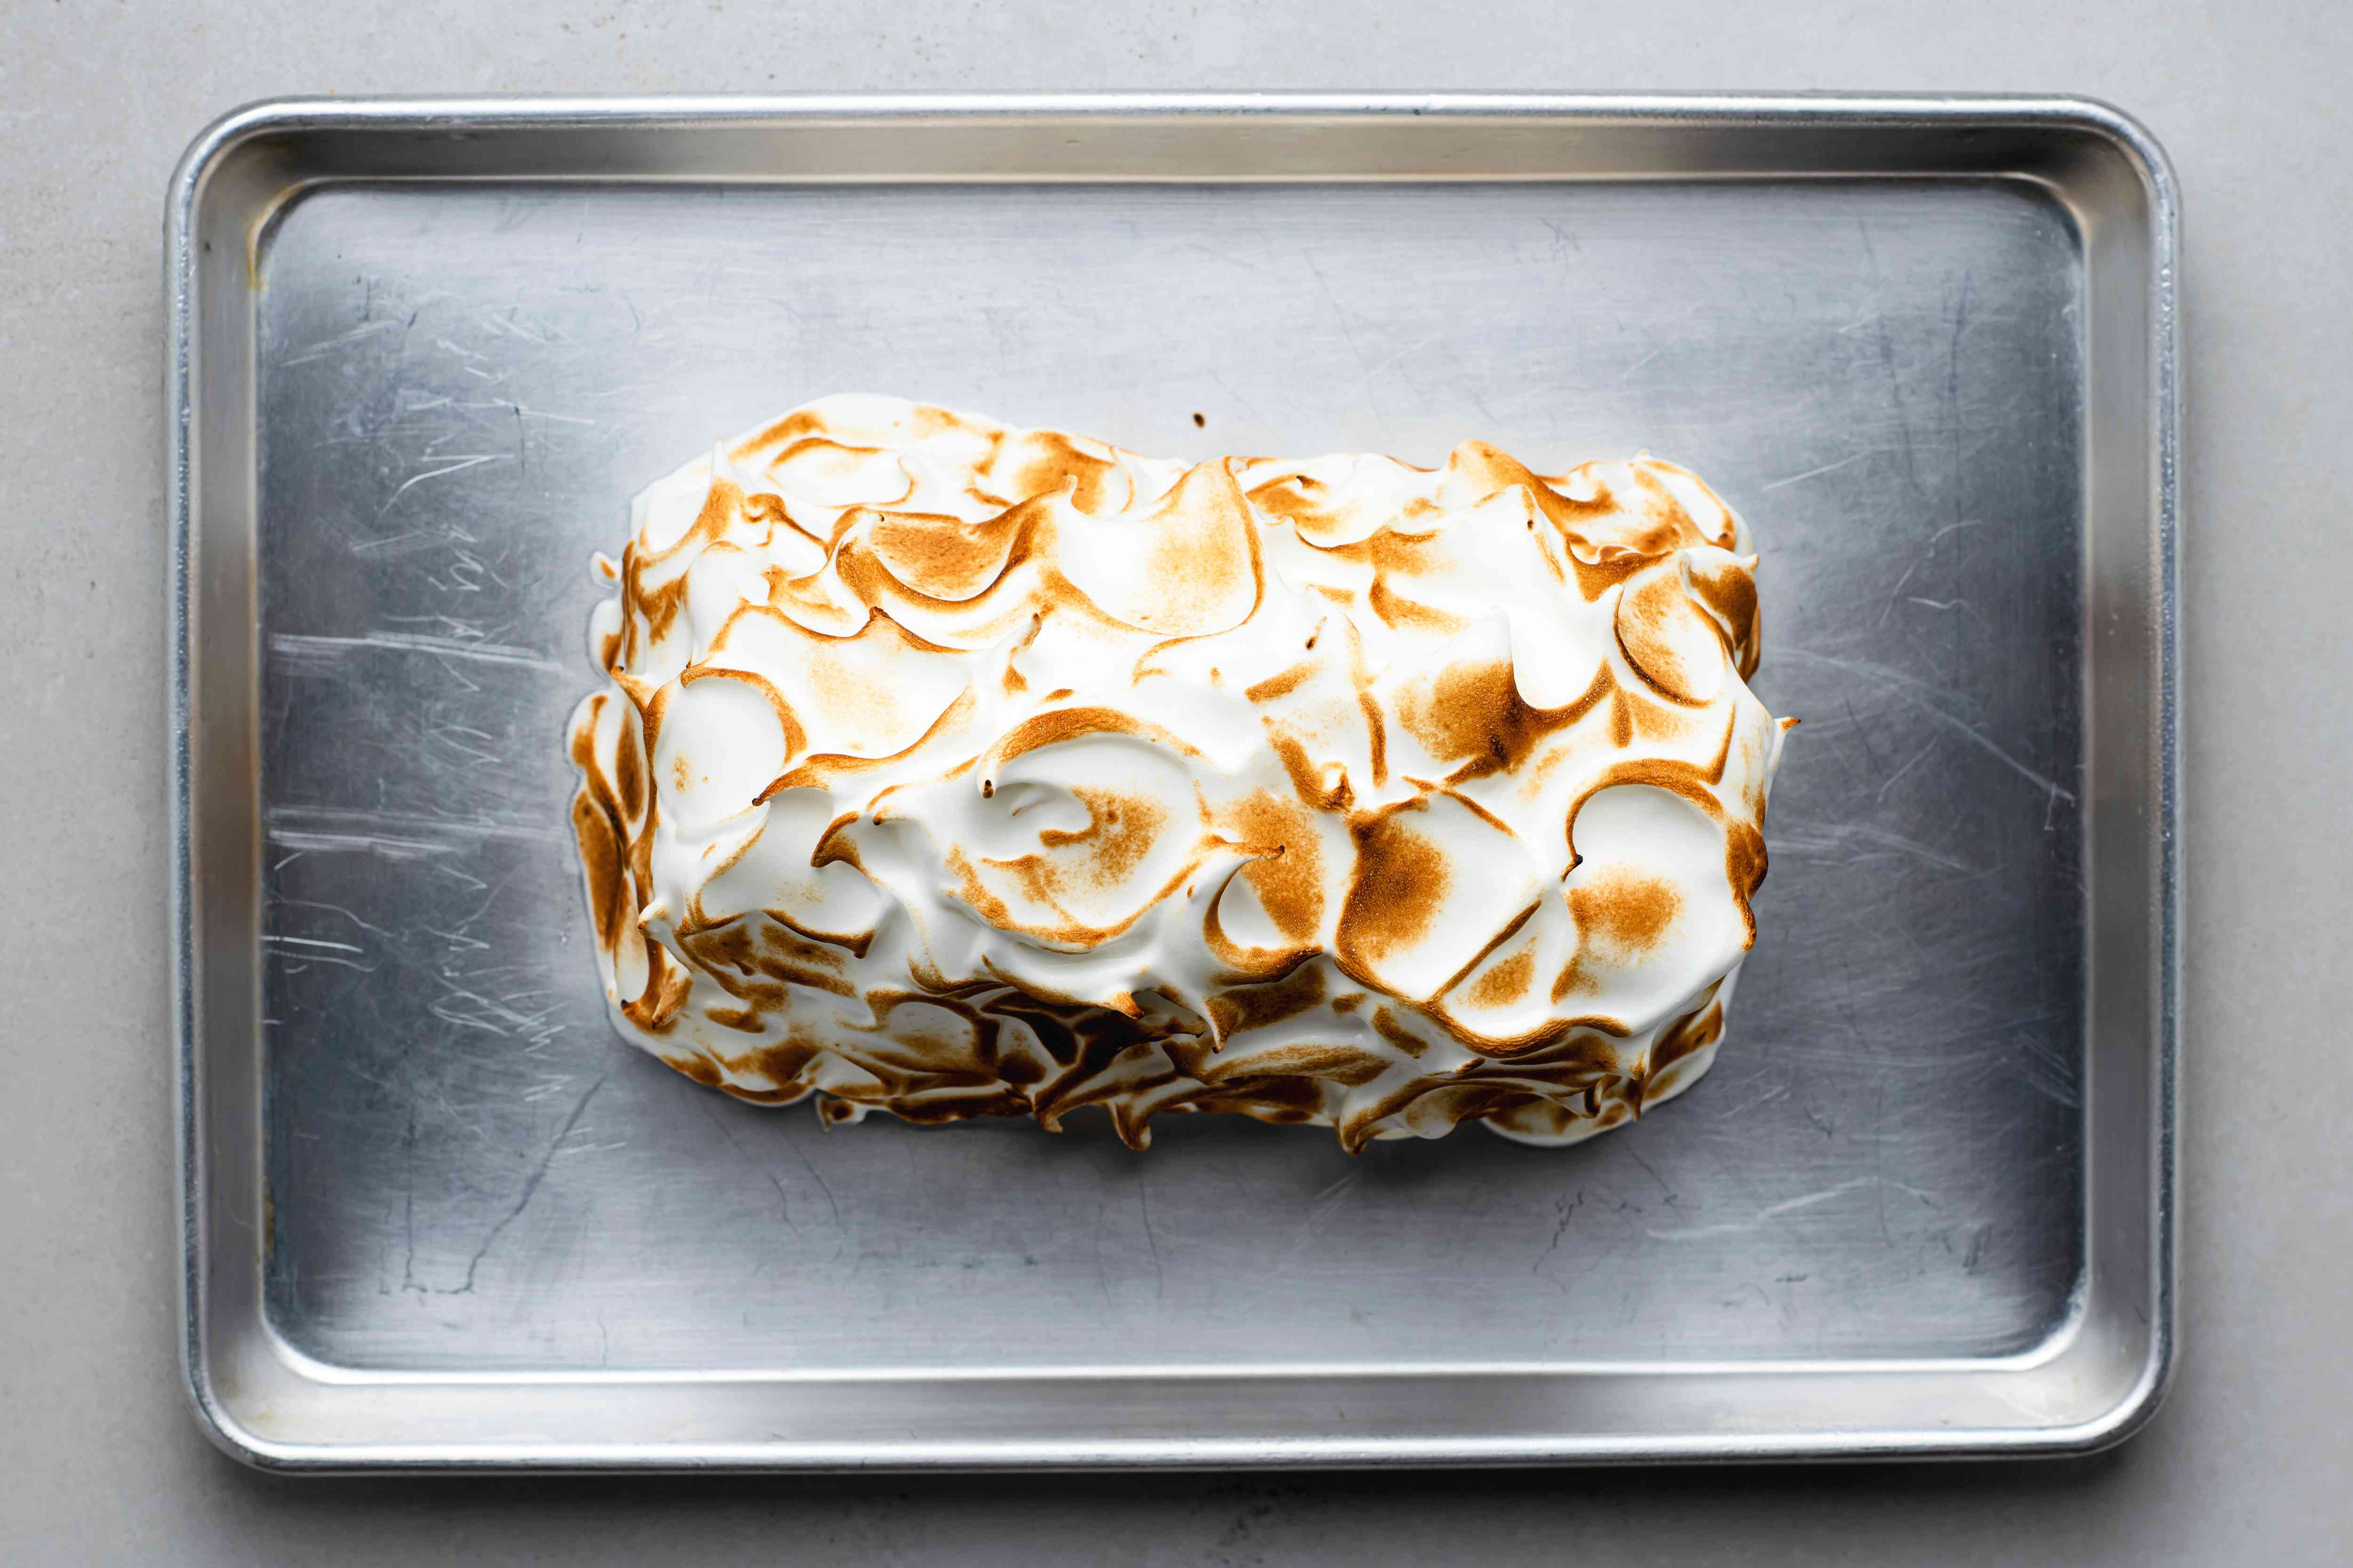 Classic Baked Alaska Dessert